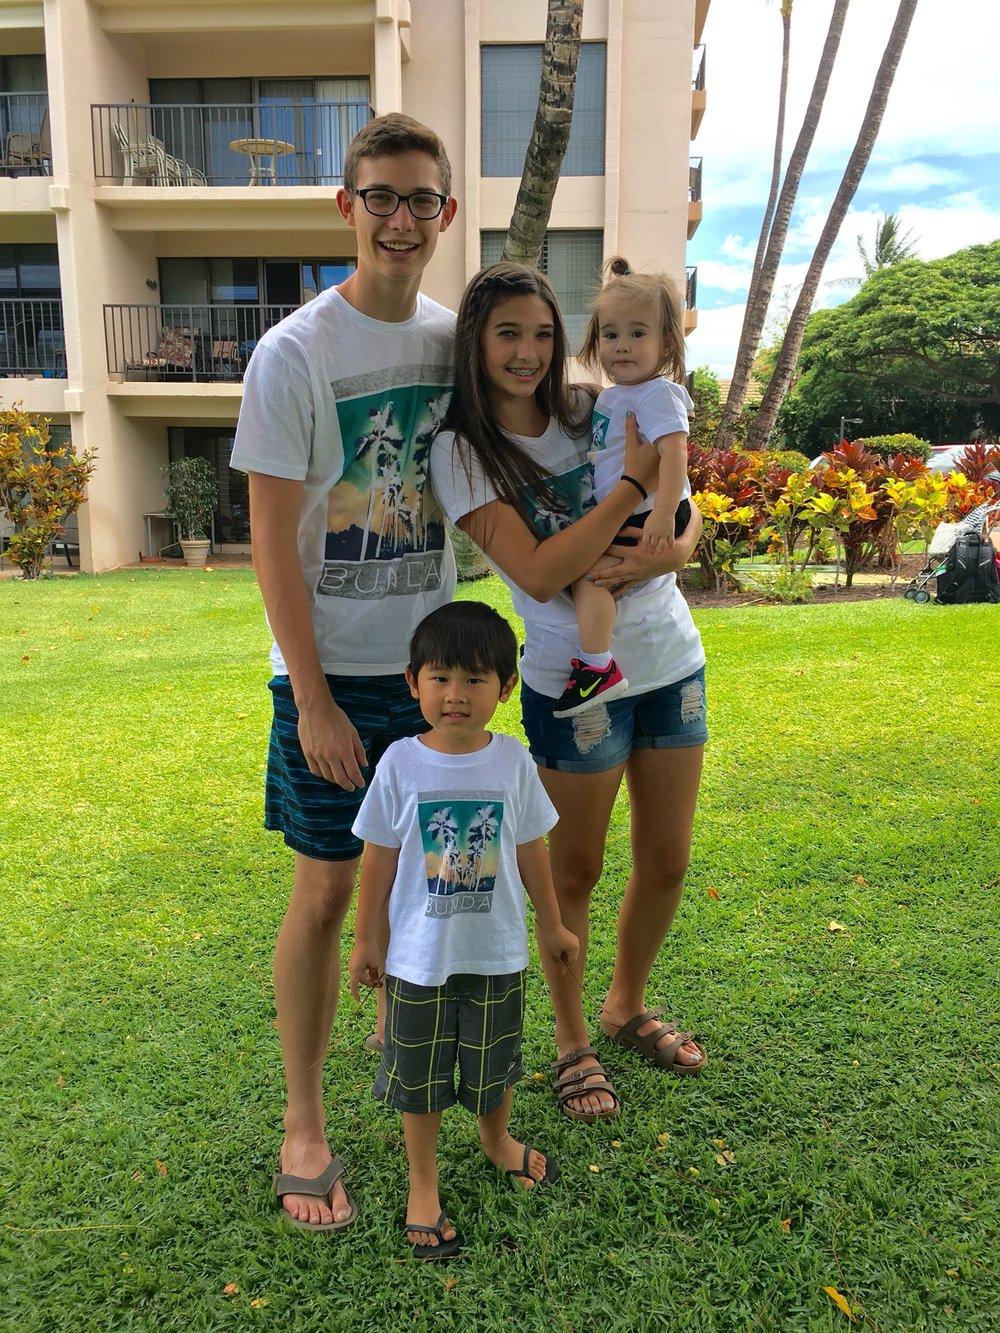 GRANDCHILDREN: CHRISTIAN, LYON, OLIVIA & RYIAN